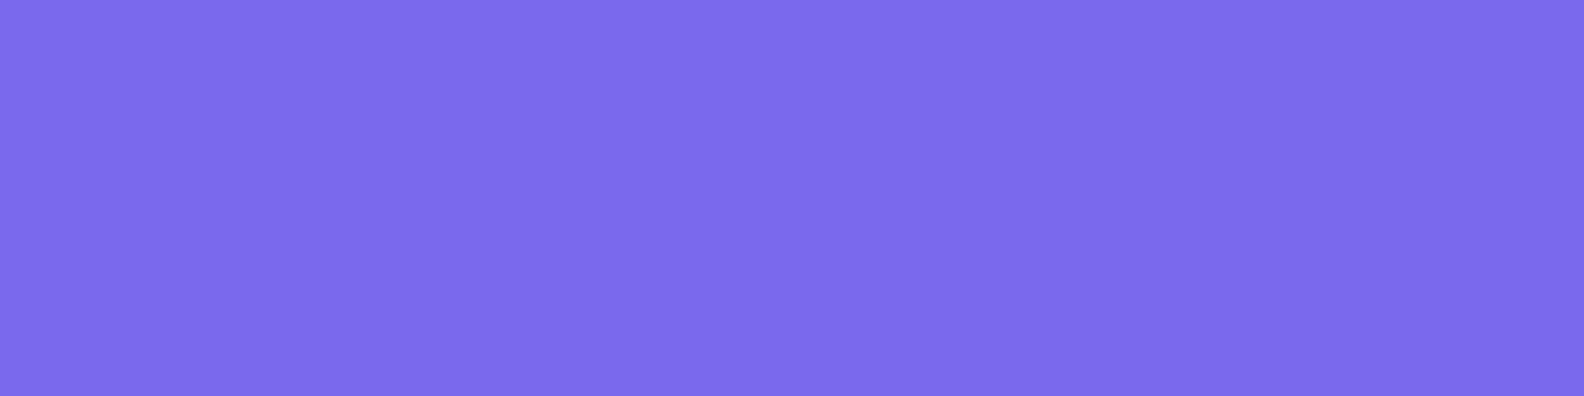 1584x396 Medium Slate Blue Solid Color Background